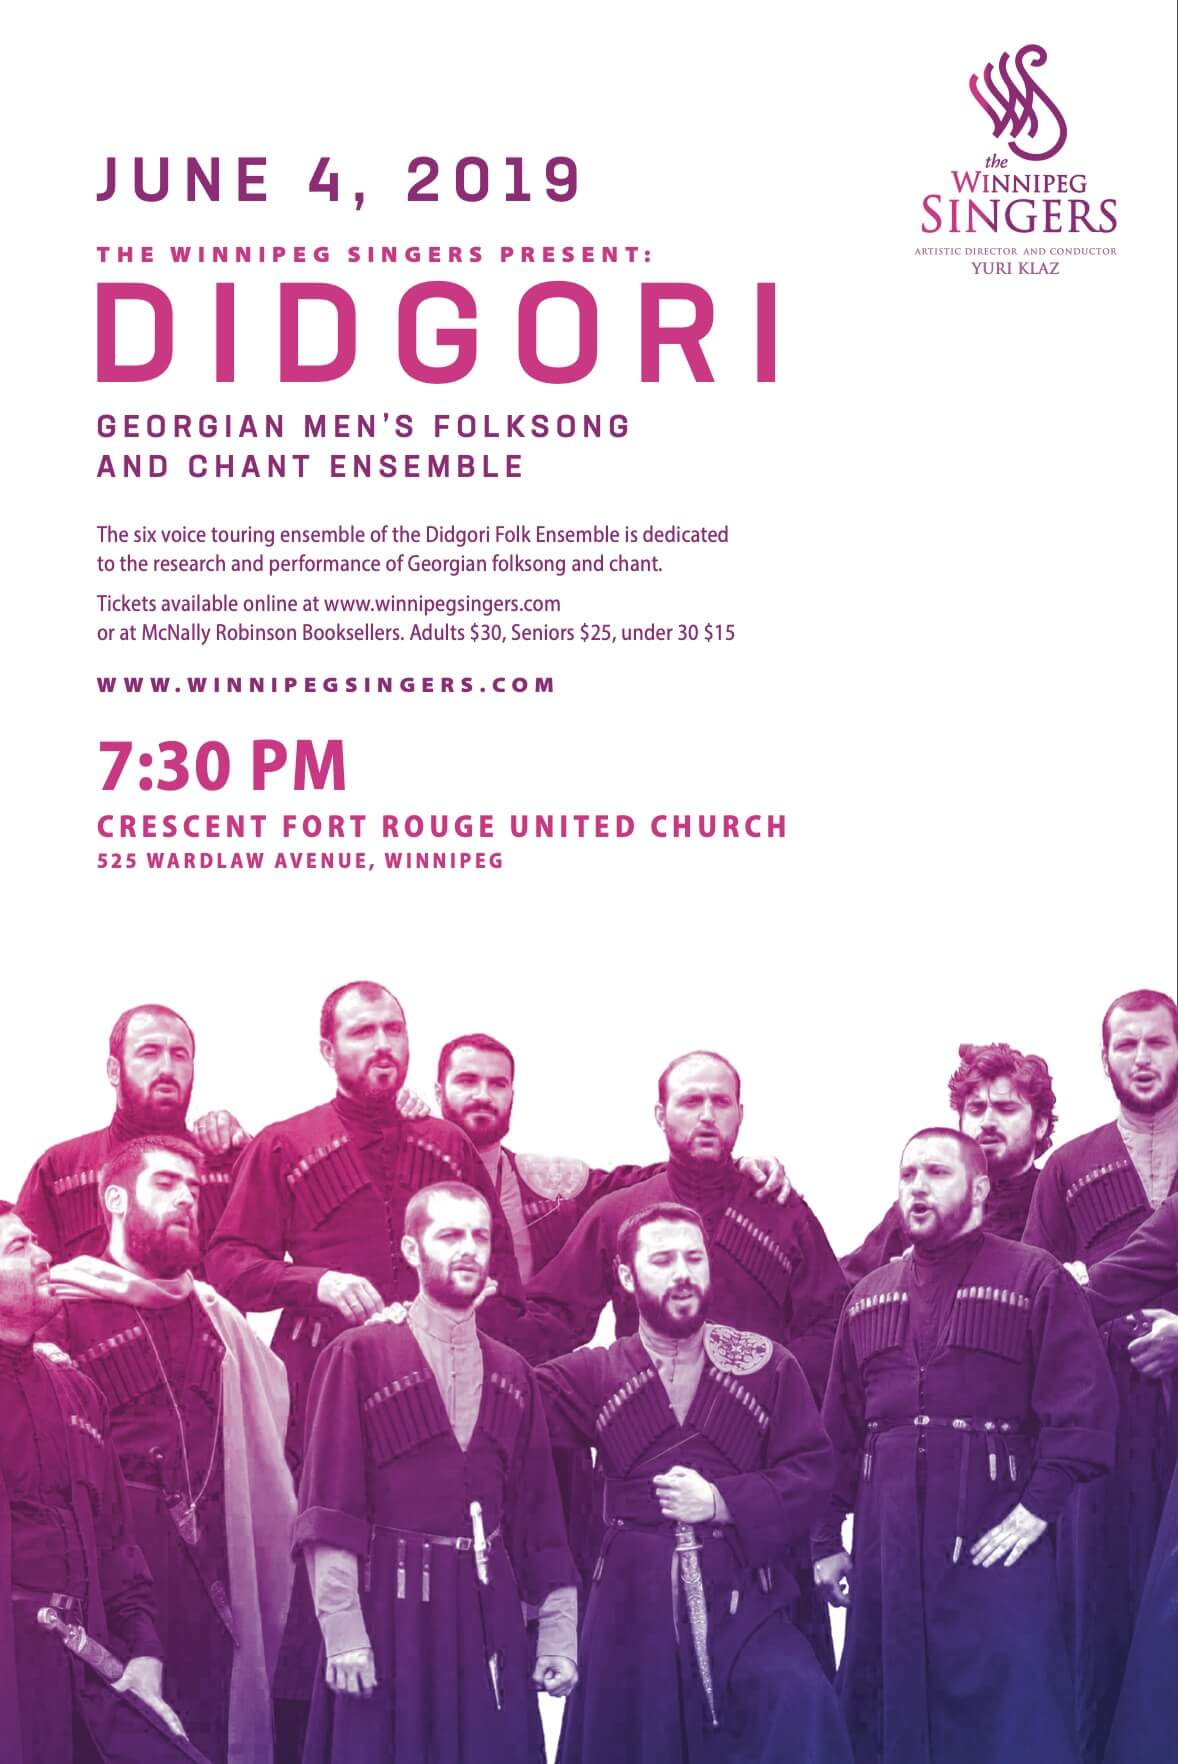 didgori-concert-jun-4-2019.jpg